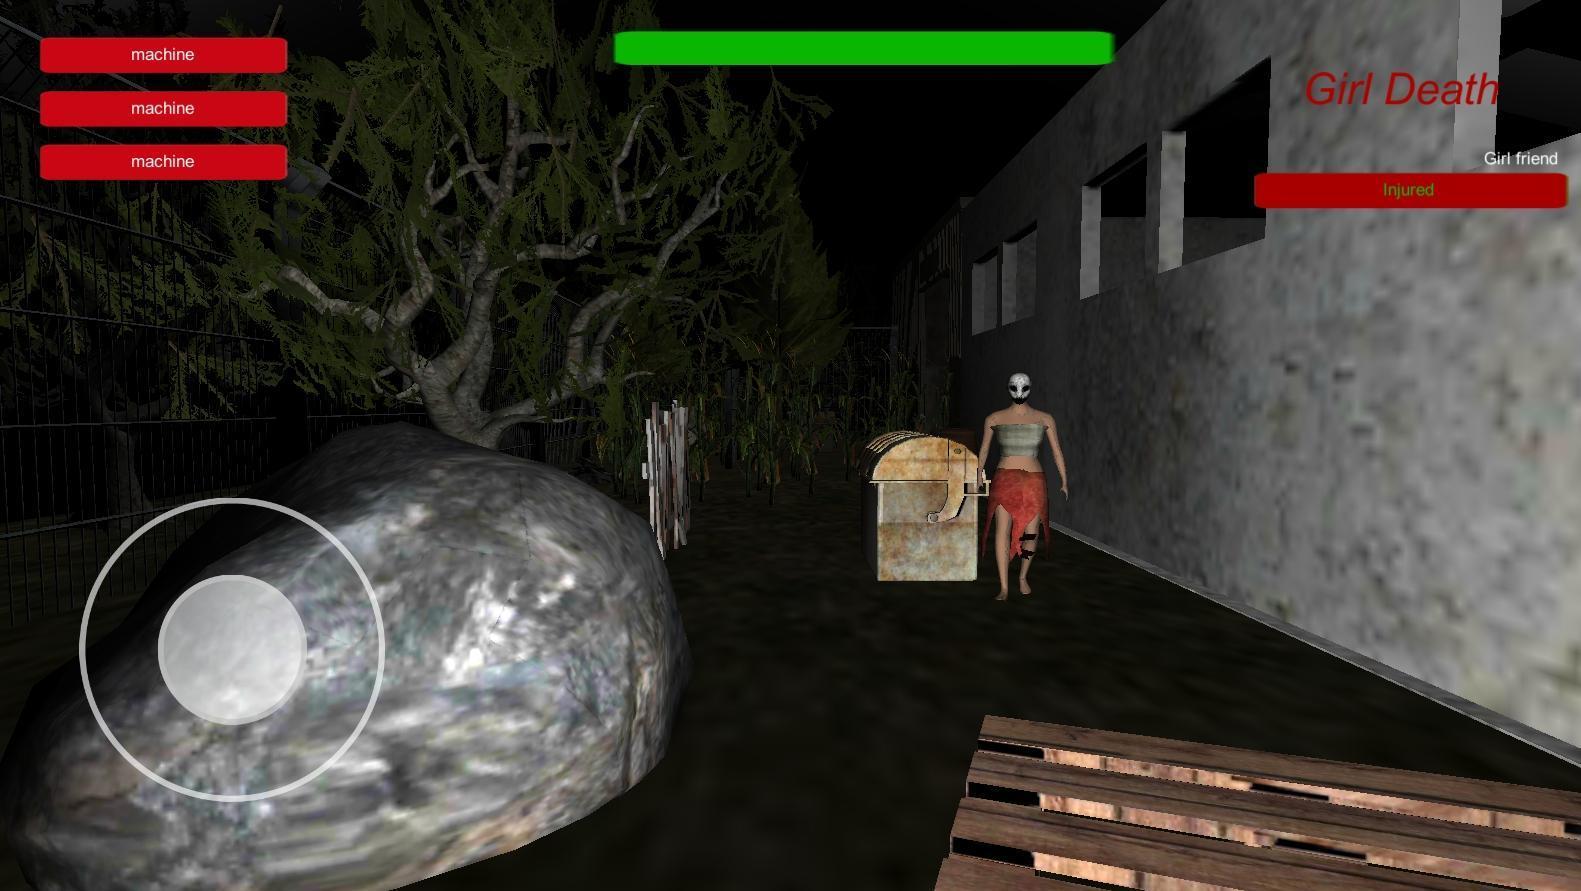 Family Creepy Scary Evil Scream Horror Game 1.6 Screenshot 4